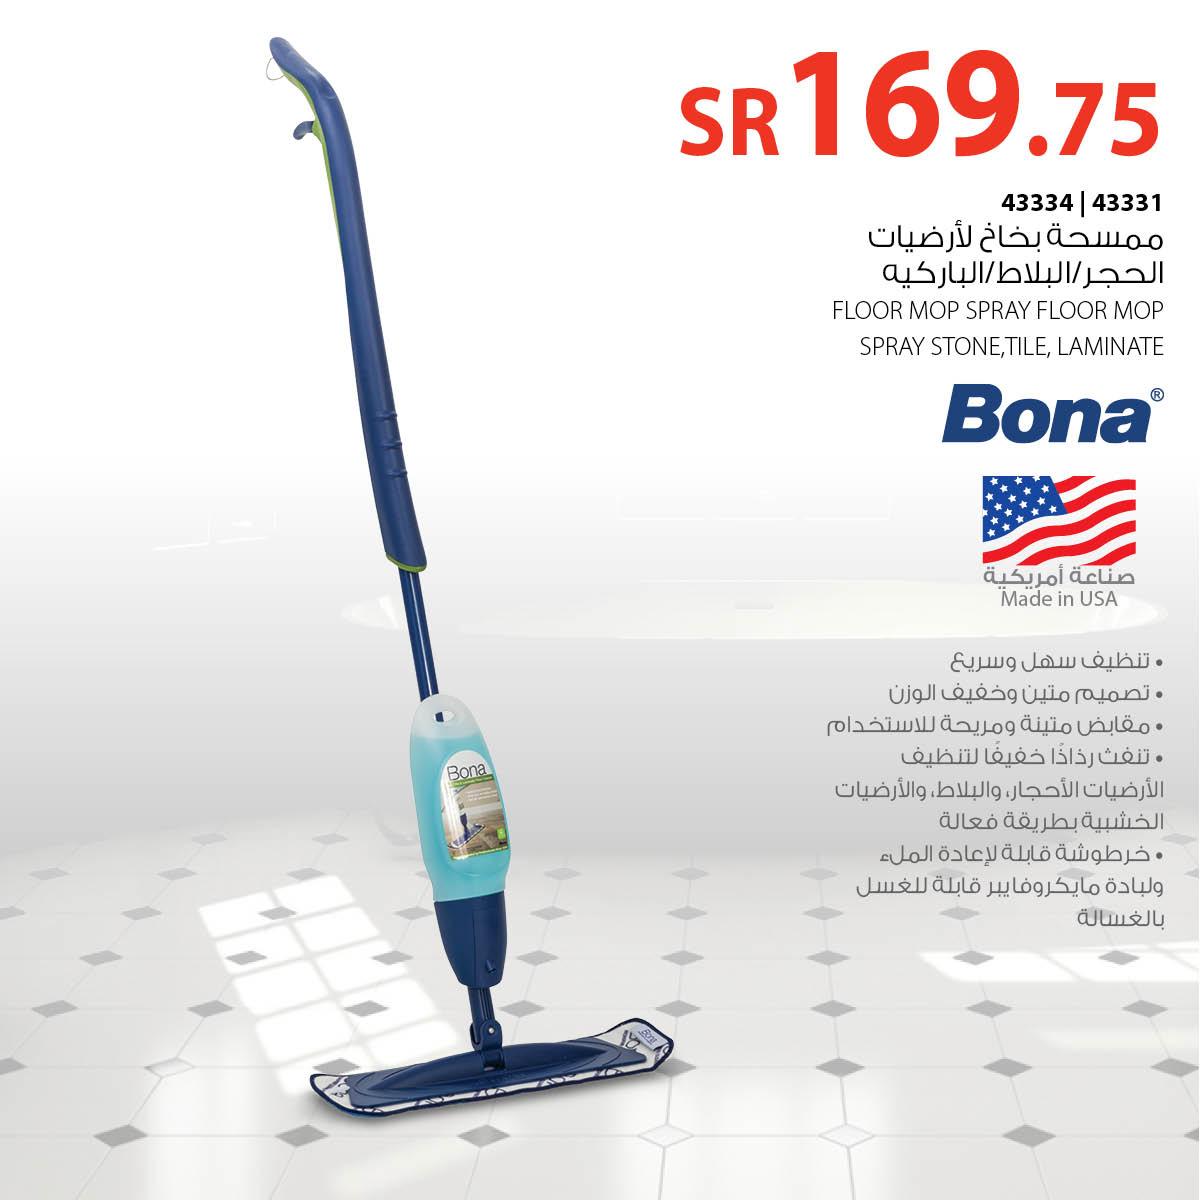 Saco ساكو On Twitter تنظيف الأرضيات صار أسهل مع ممسحة البخاخ المبتكرة بمزايا عديدة الكل للكل ساكو